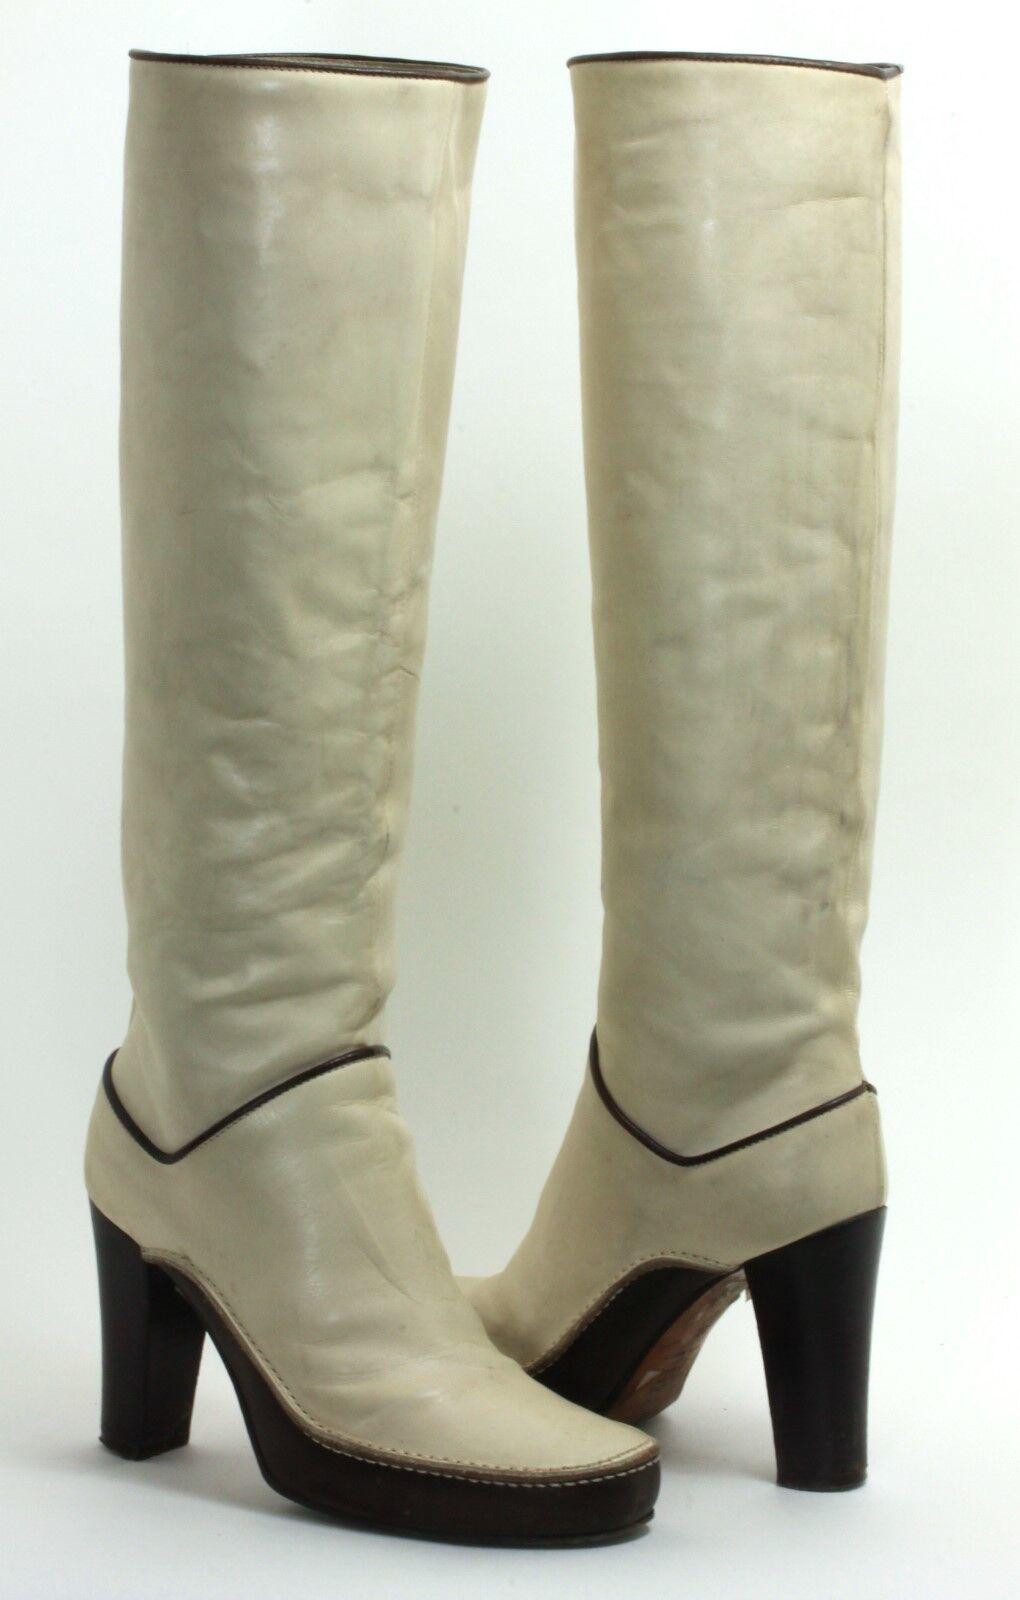 Damenstiefel Vintage Stiefel High Heels Plateau Diesel Creme Beige 36